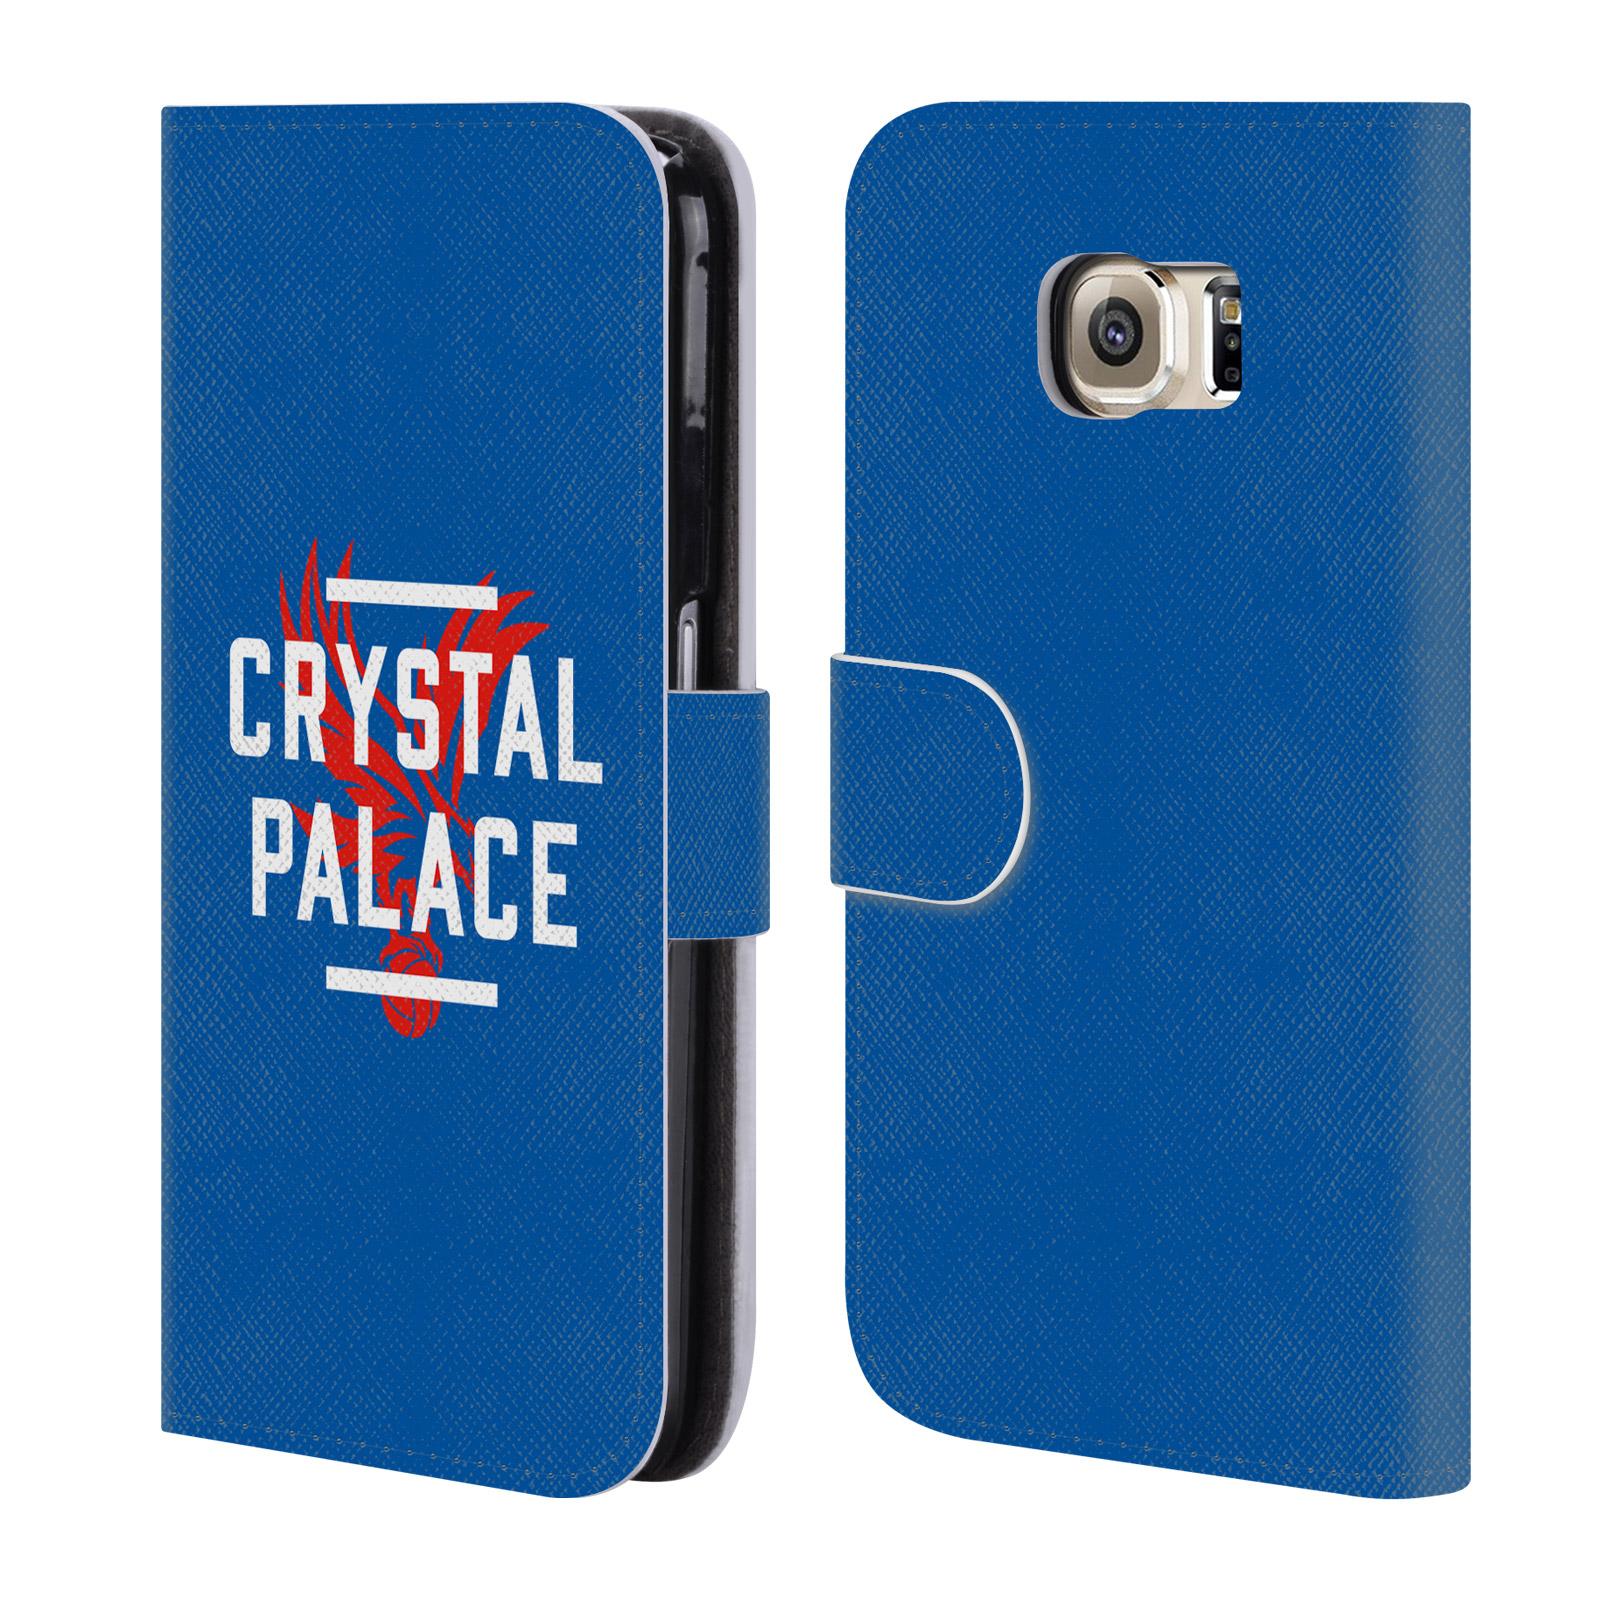 CRYSTAL-PALACE-FC-THE-EAGLES-ETUI-COQUE-EN-CUIR-POUR-SAMSUNG-TELEPHONES-1